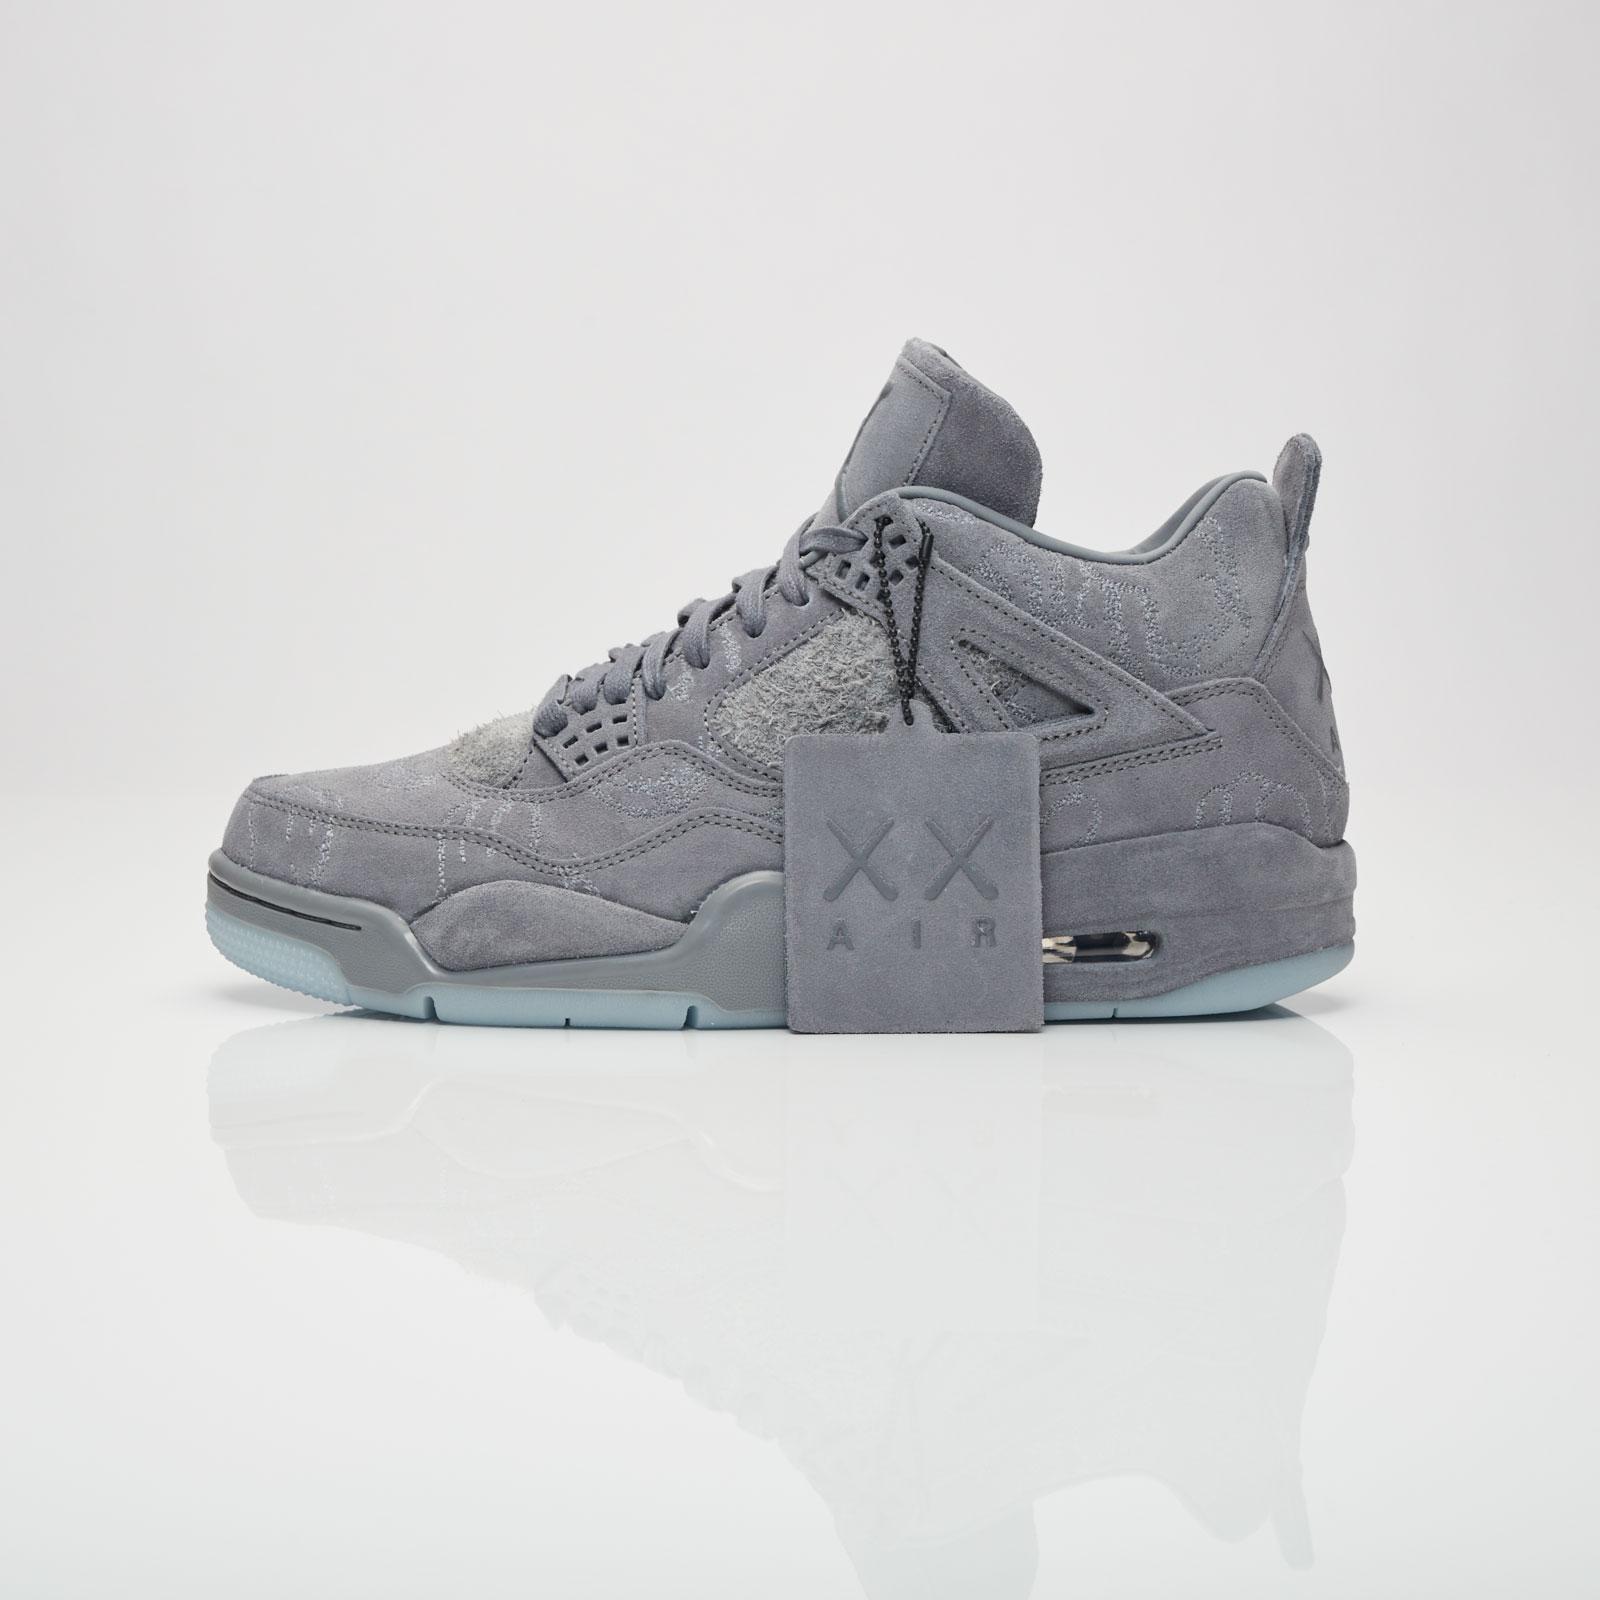 kaws jordan 4 sneakersnstuff